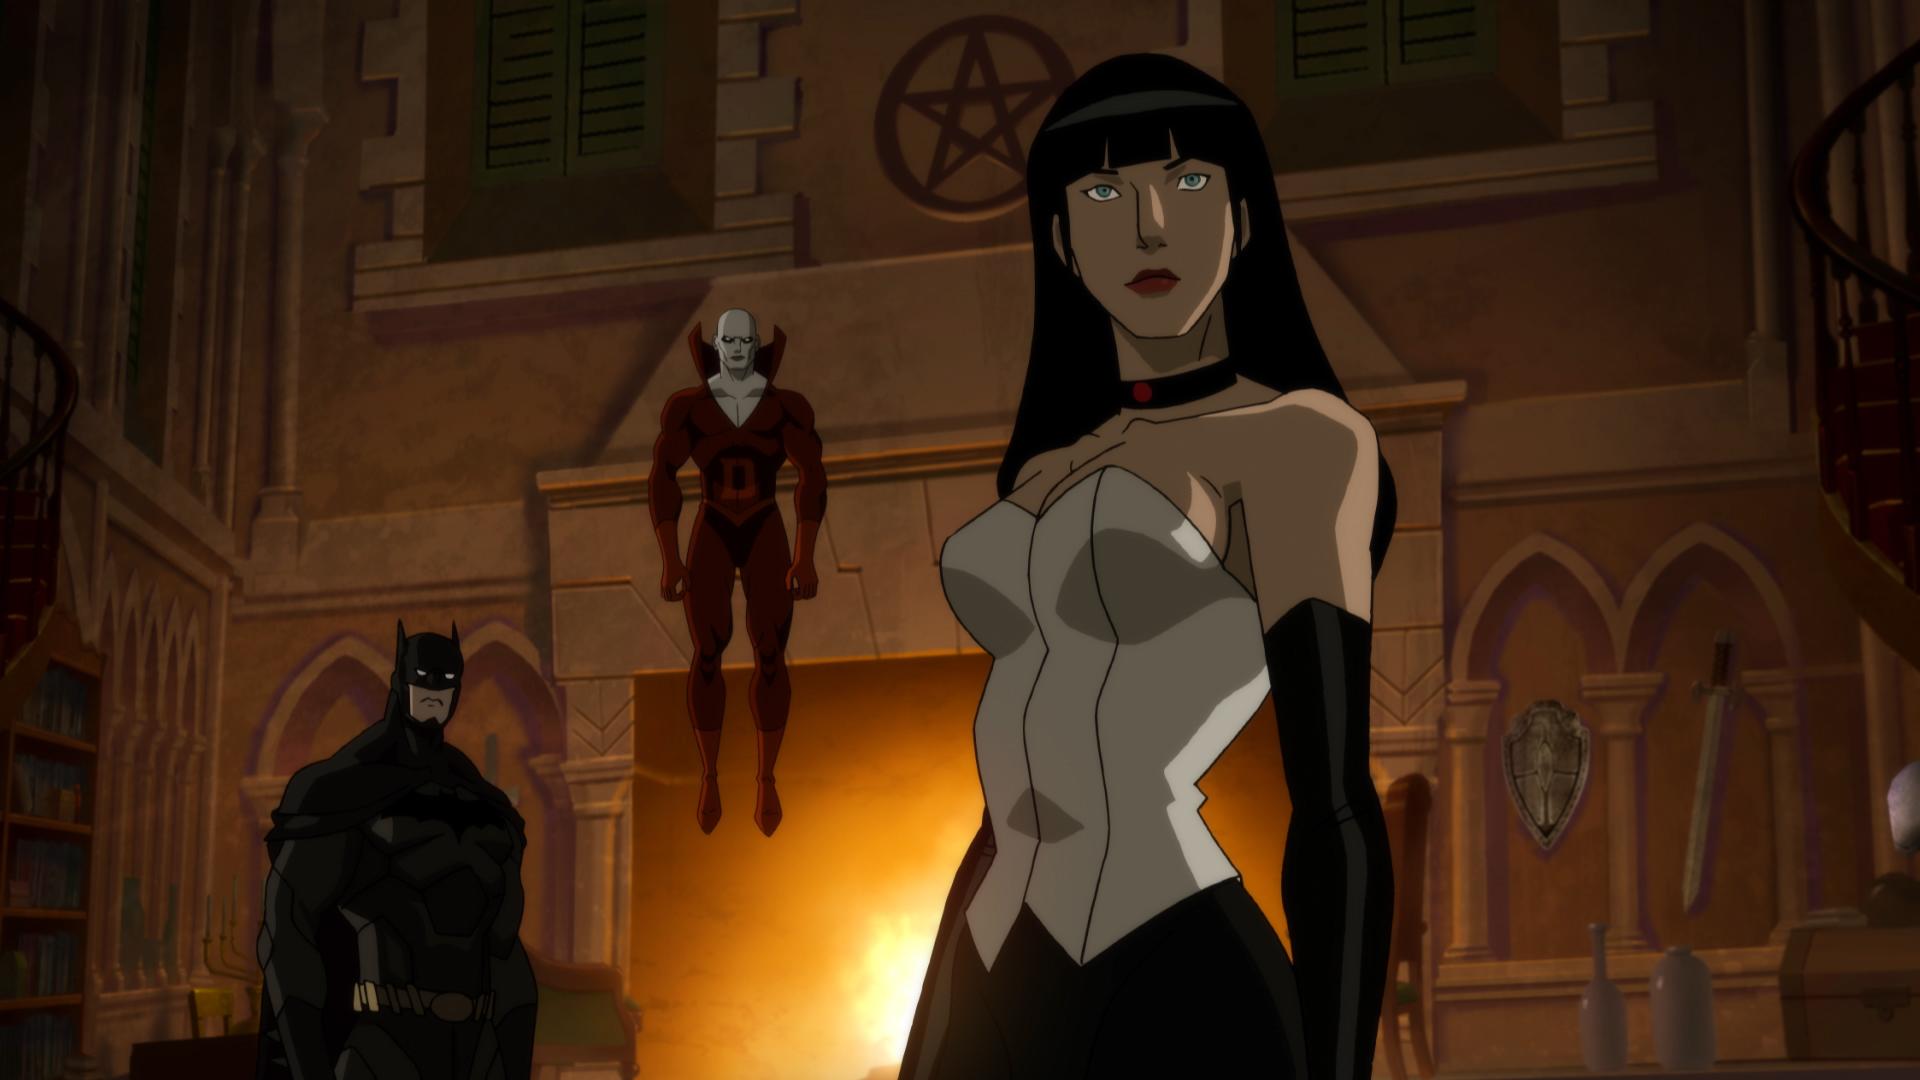 zatanna zatara justice league dark